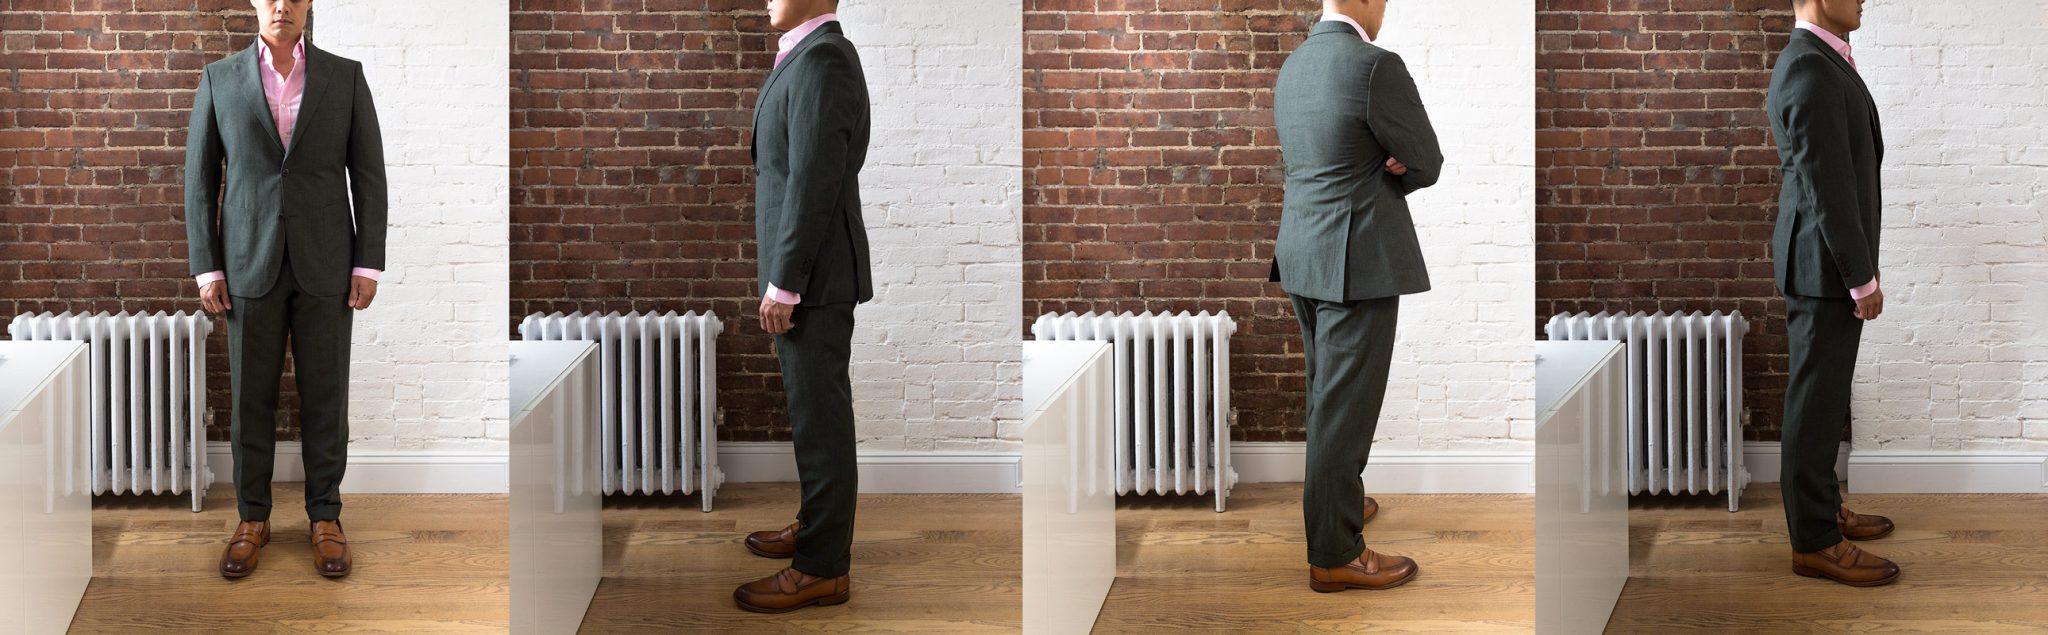 MTM Showdown: Unboxing The Oliver Wicks Suit